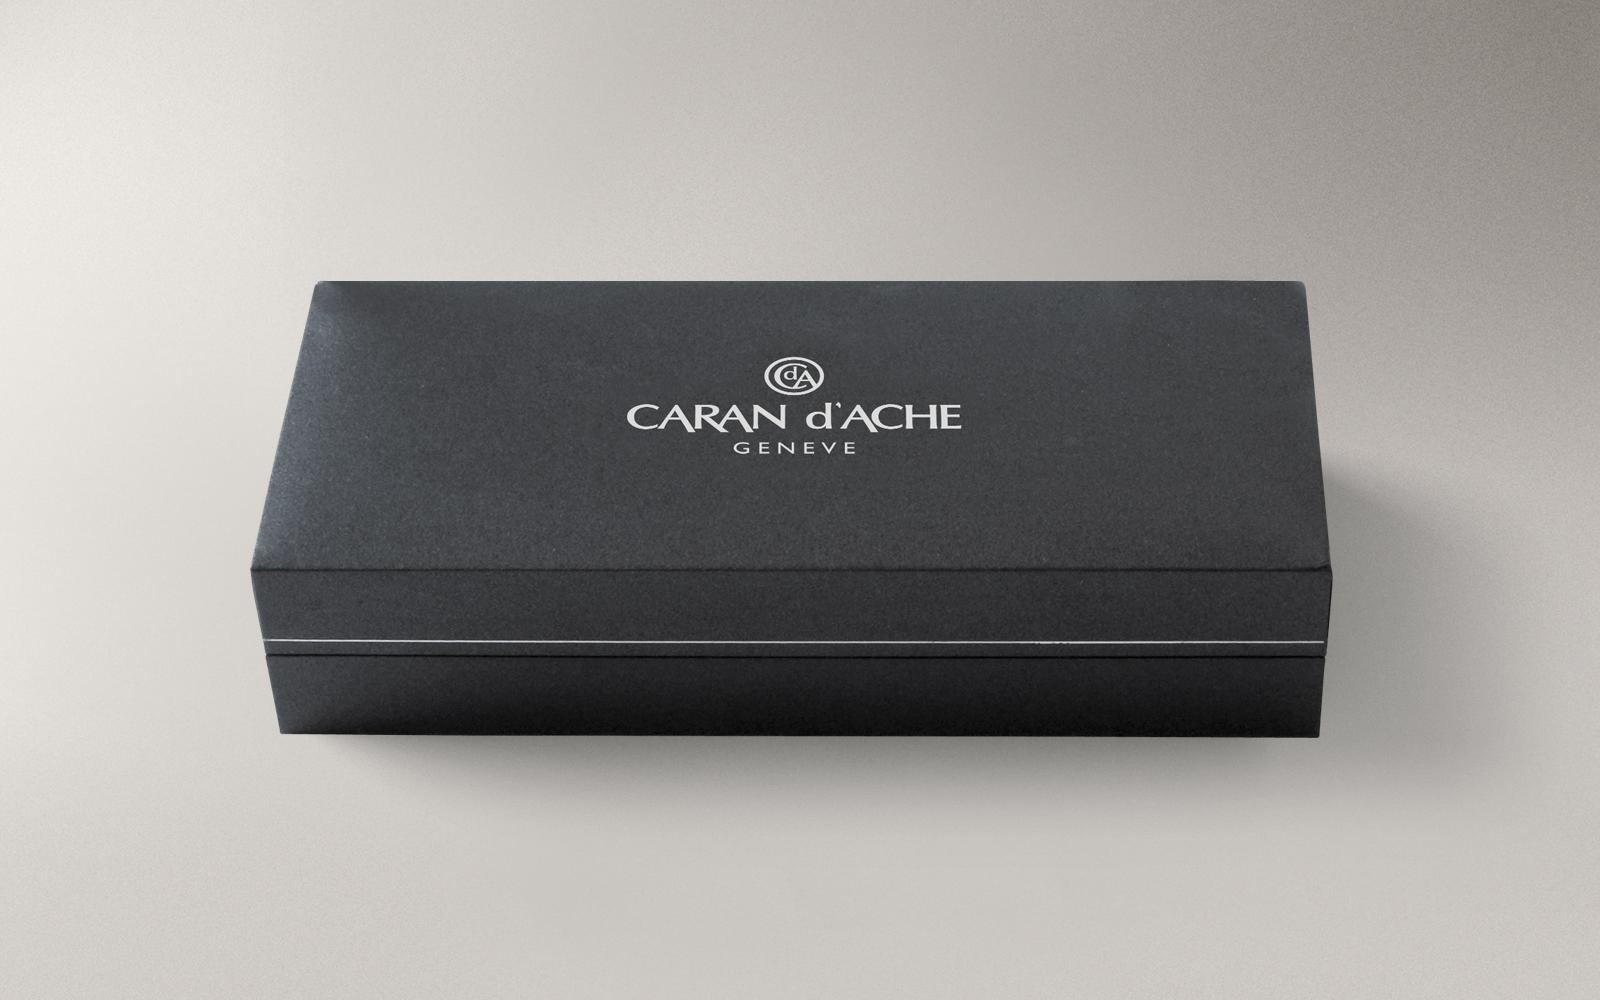 Carandache Varius - Ivanhoe Black, шариковая ручка, F